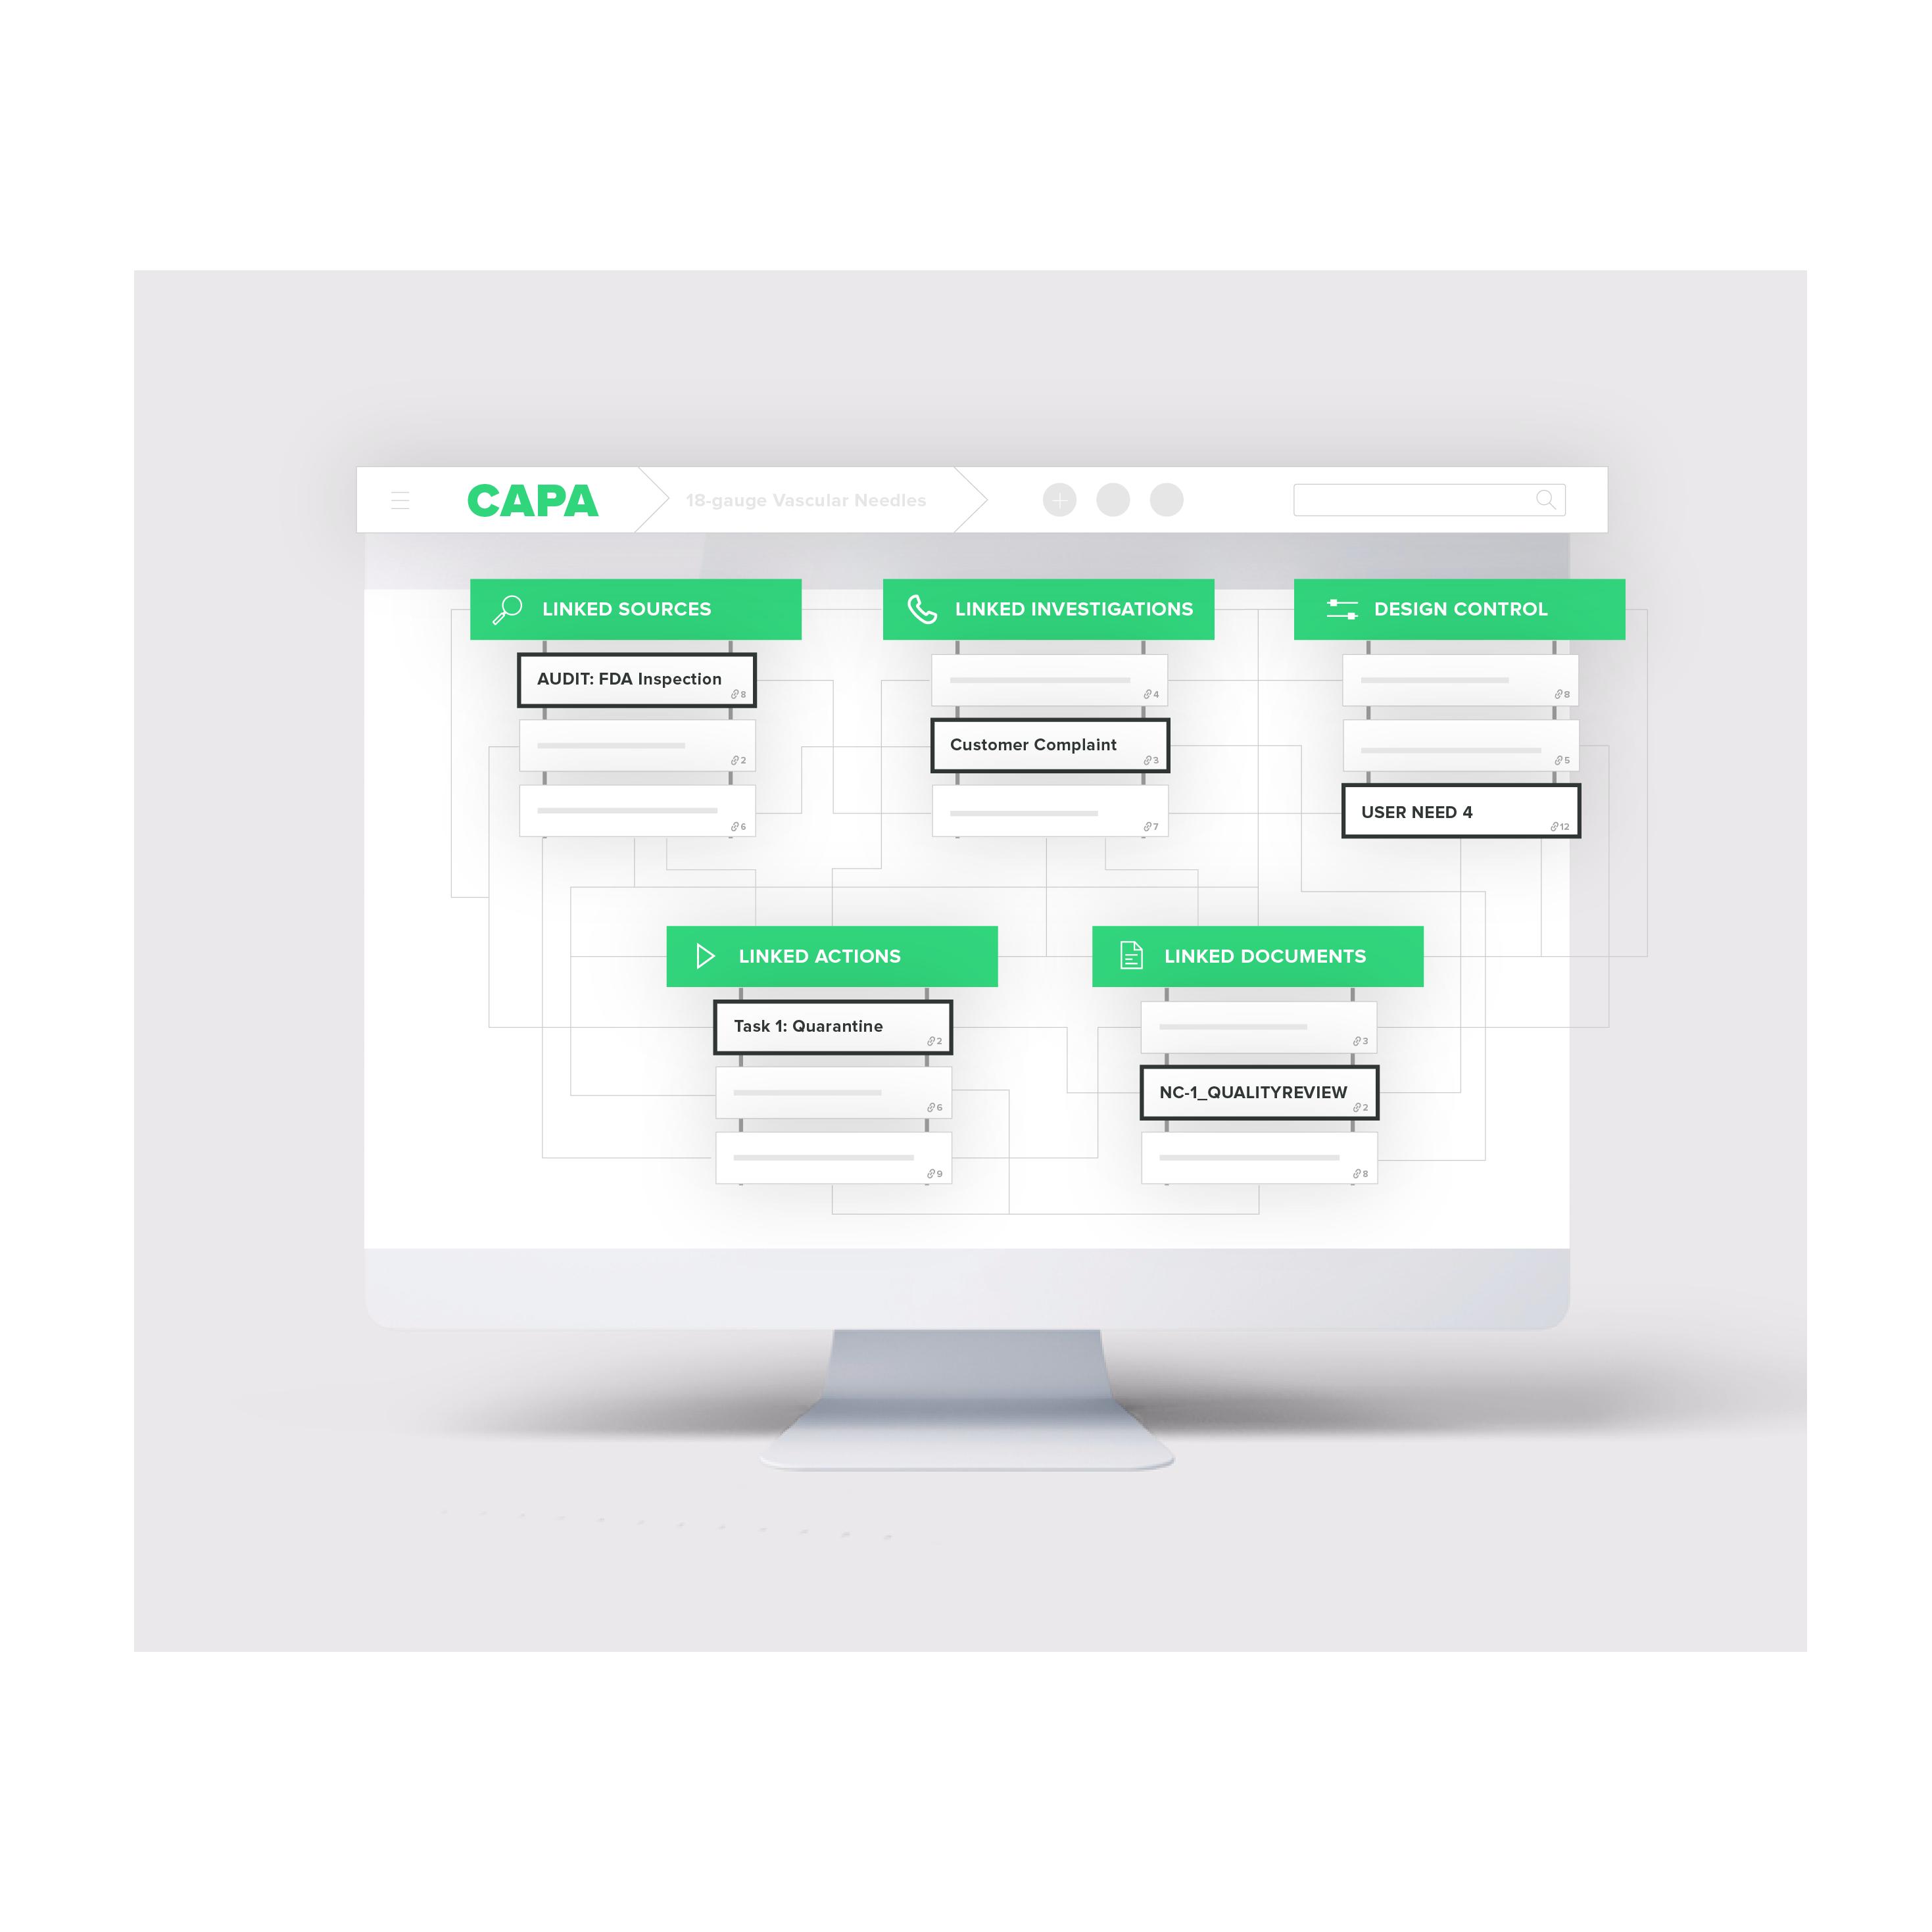 CAPA_management_software